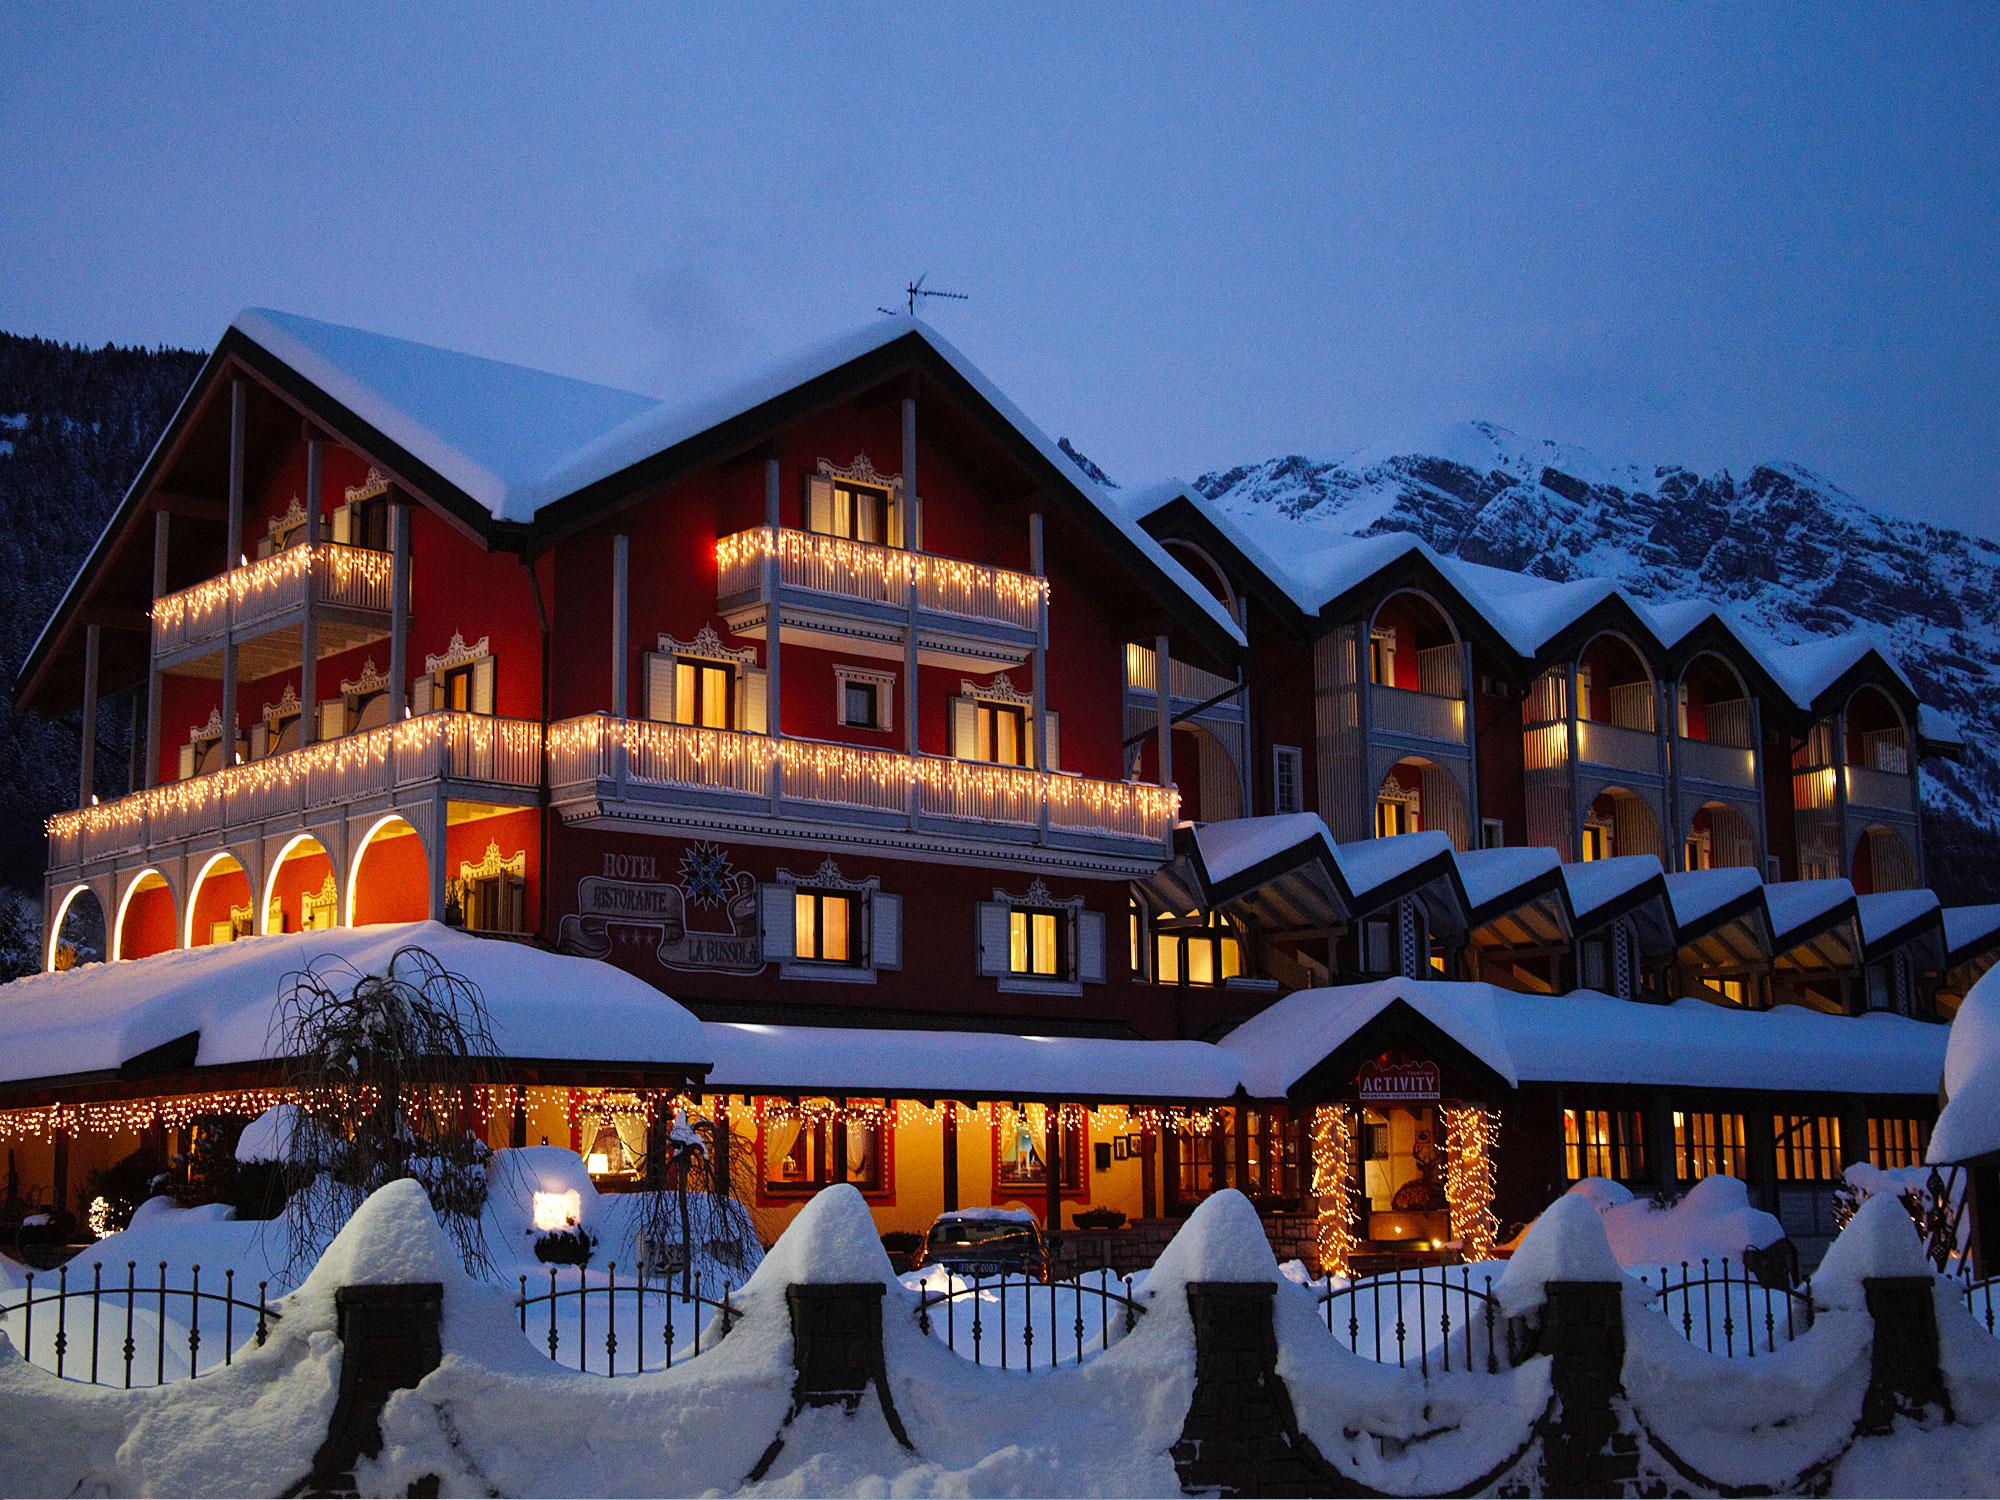 Hotel La Bussola Inverno